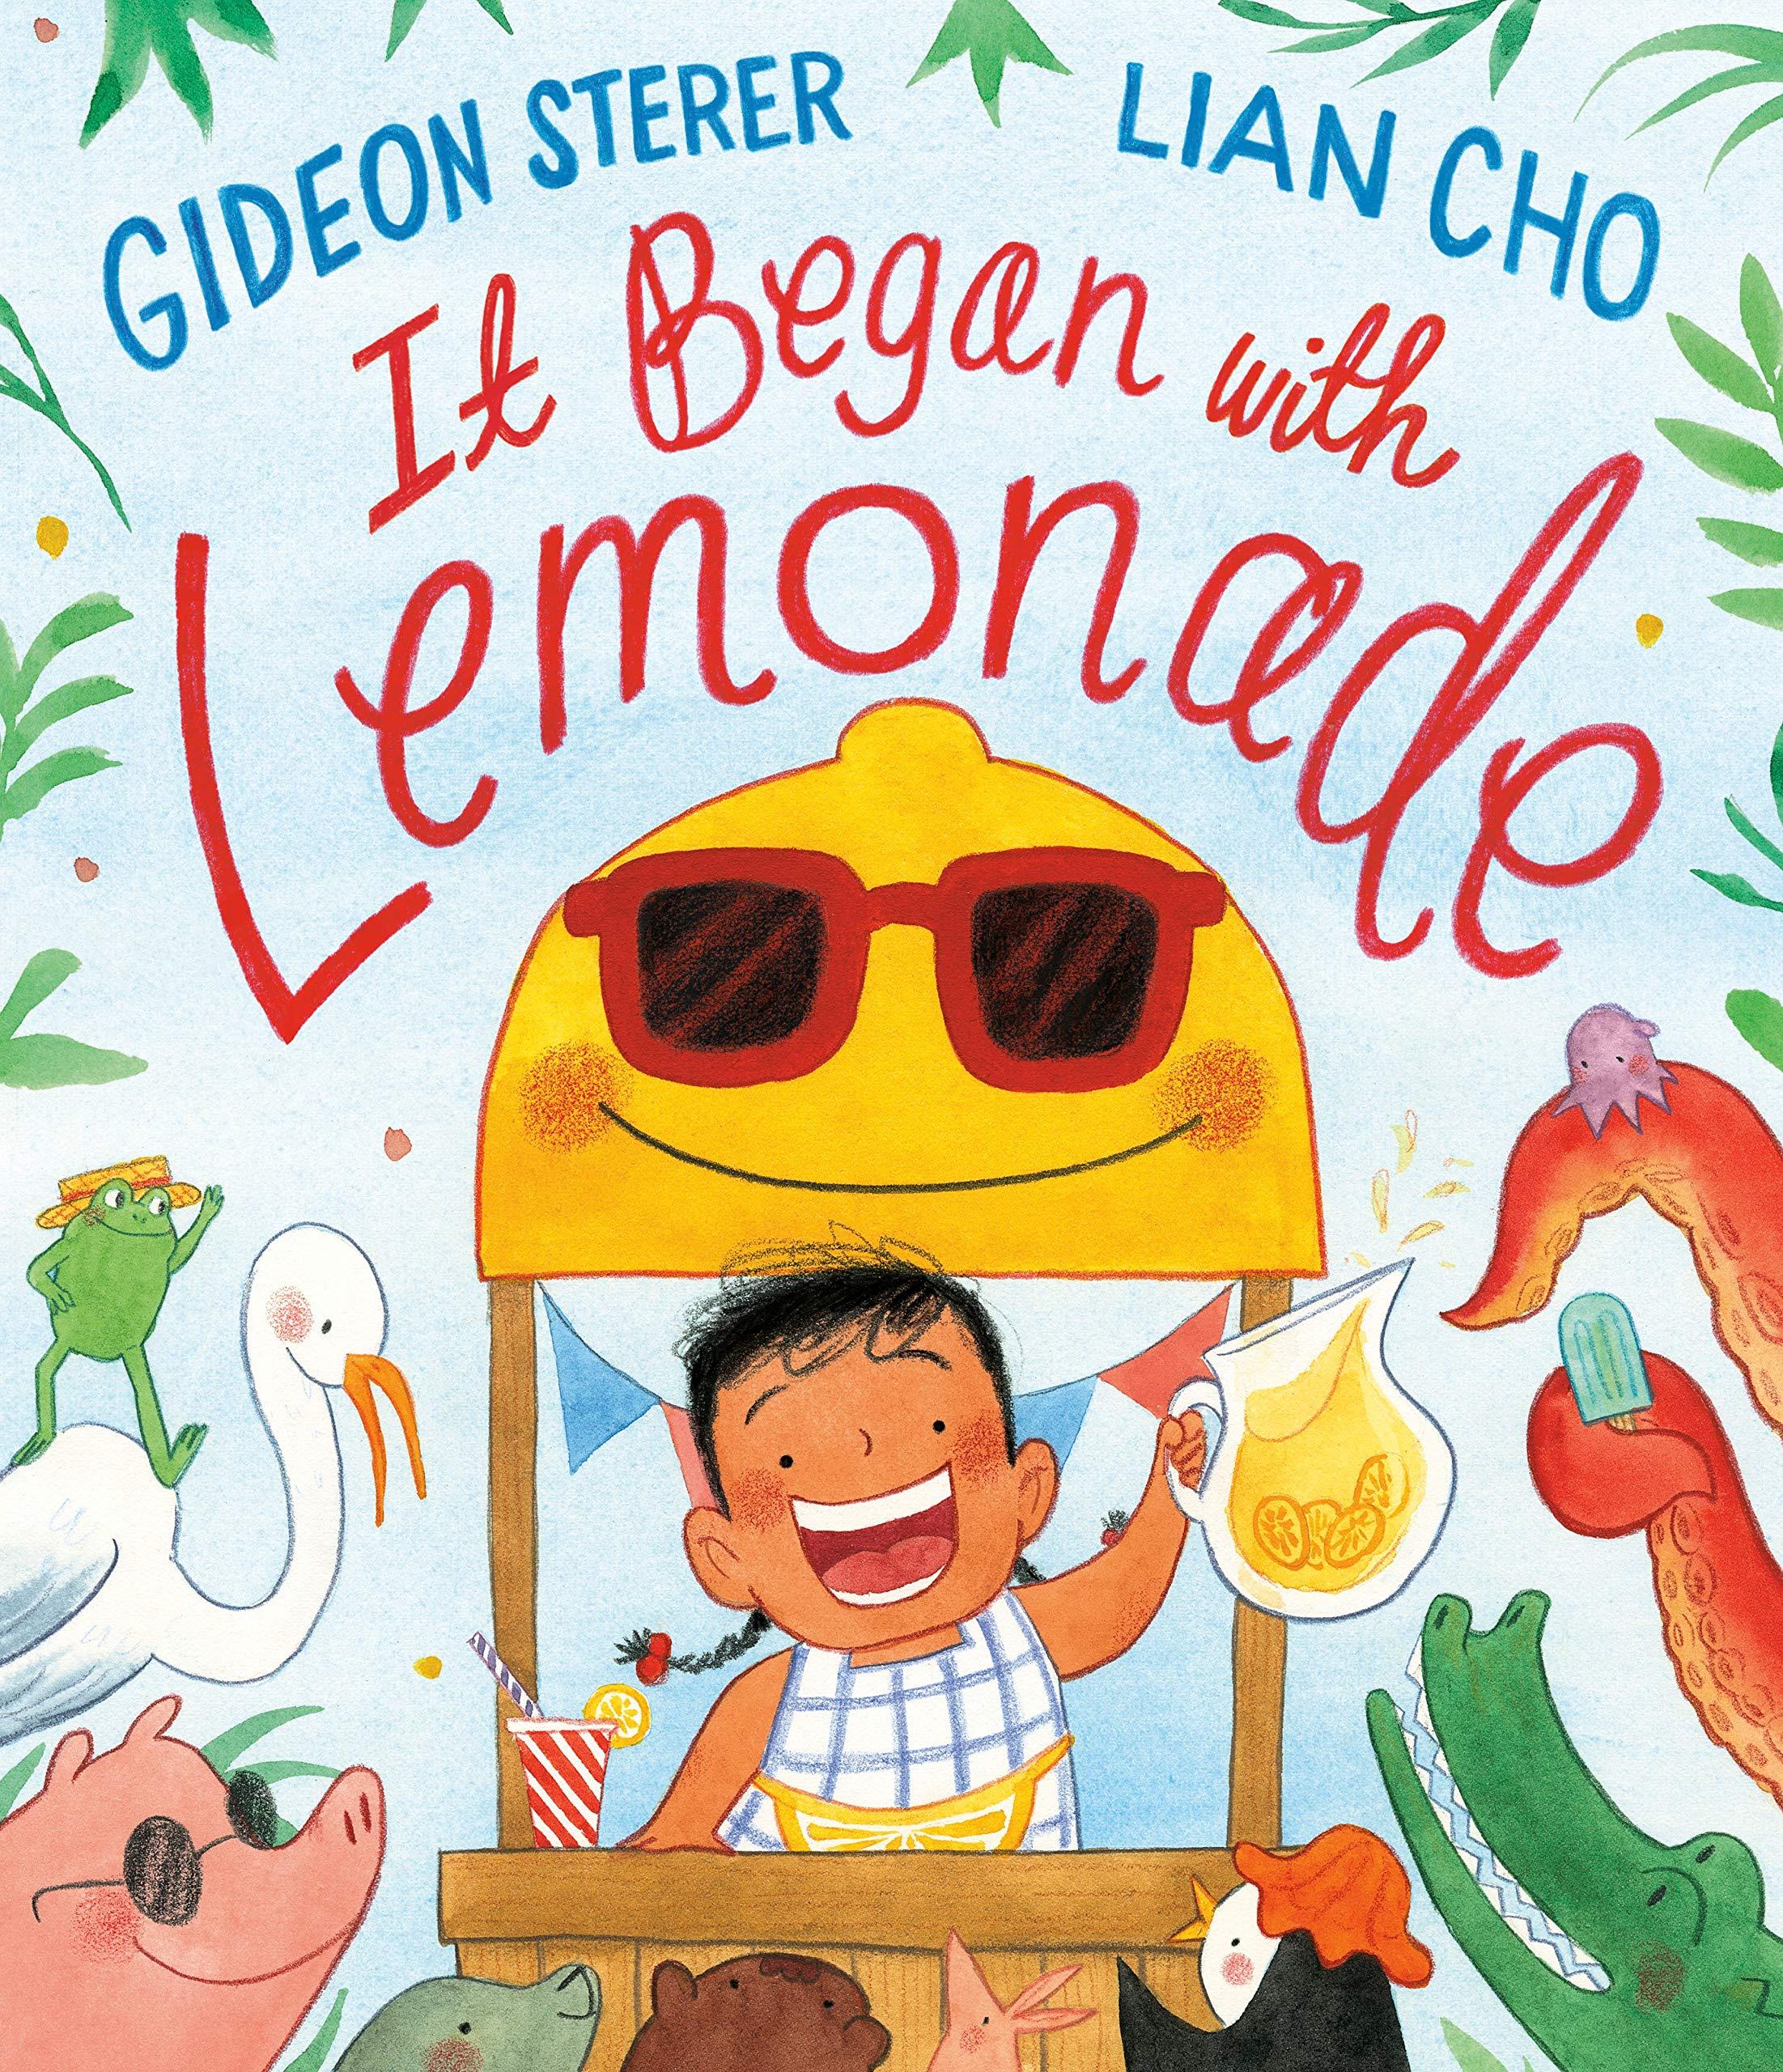 It Began with Lemonade: Sterer, Gideon, Cho, Lian: 9780735228283: Amazon.com:  Books